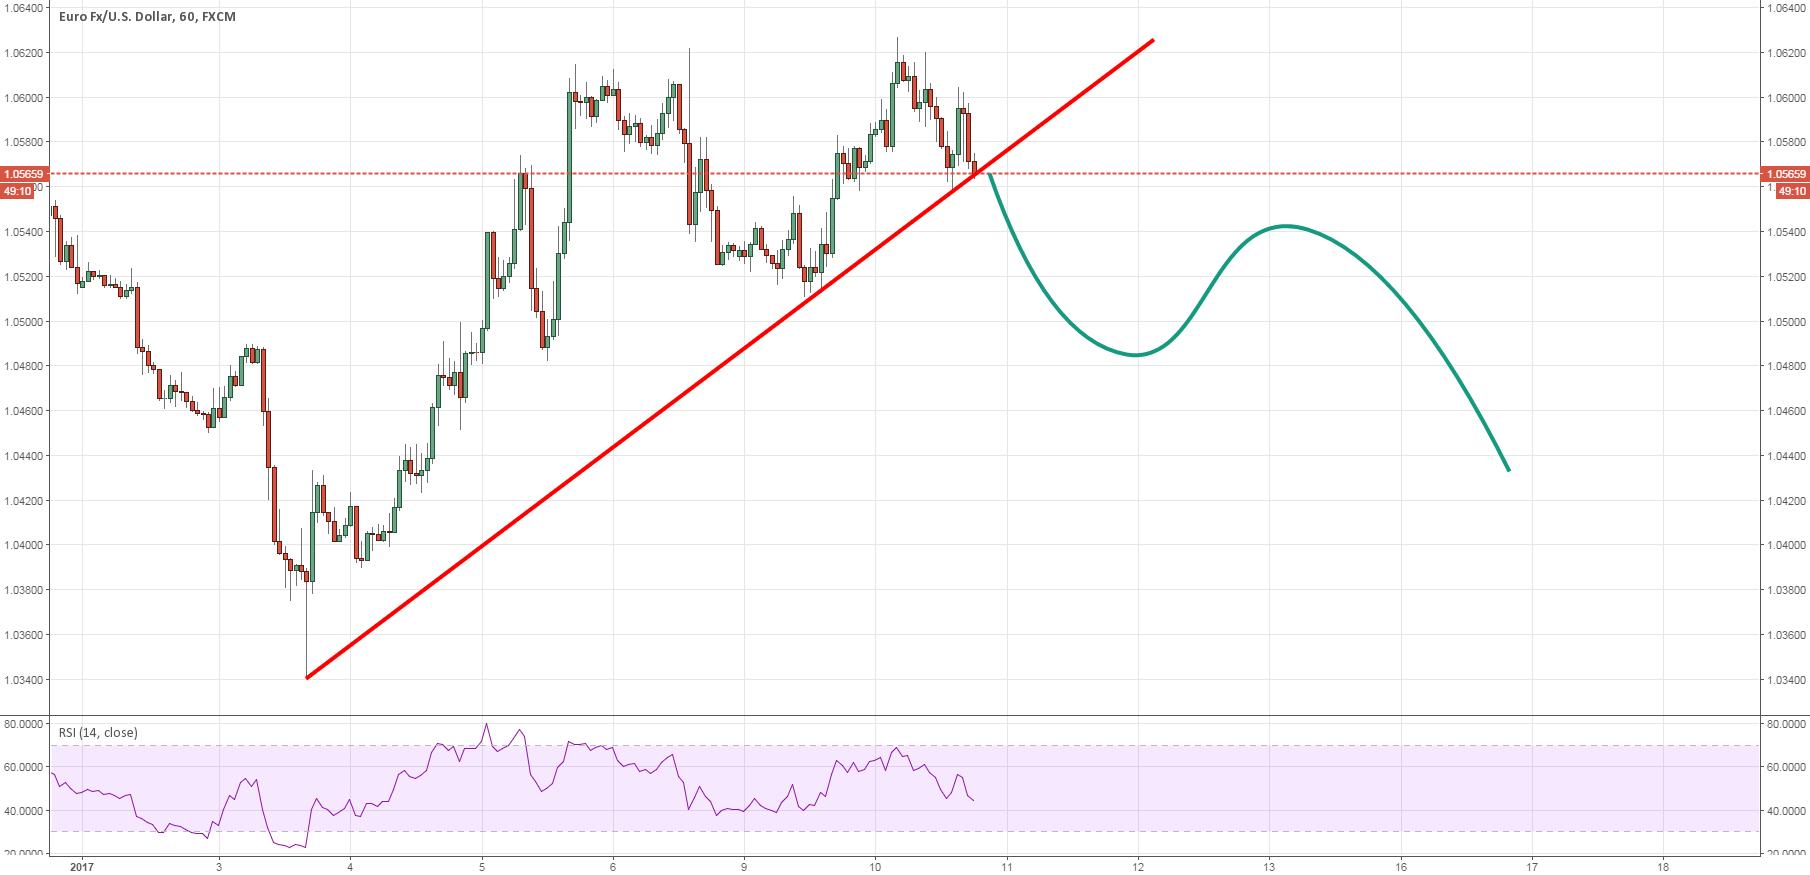 EURUSD: It's happening again traders